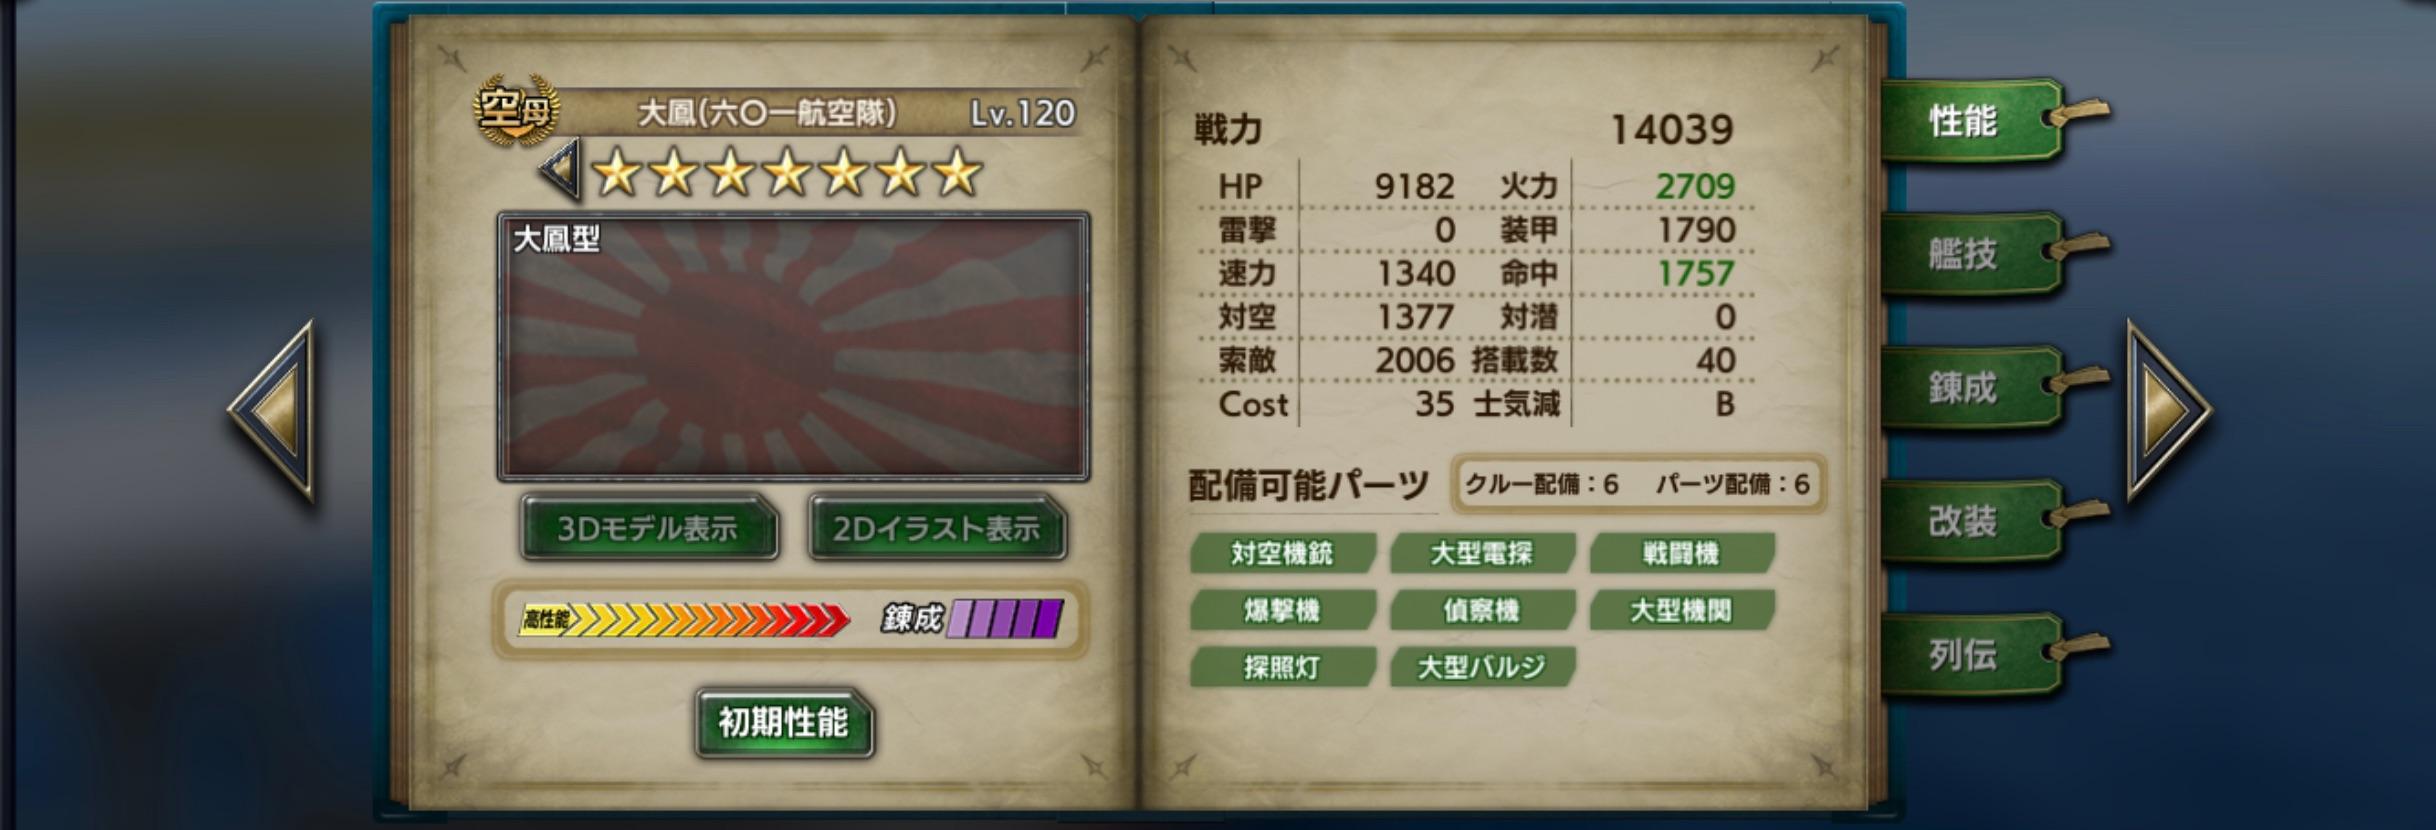 Taiho6-performance